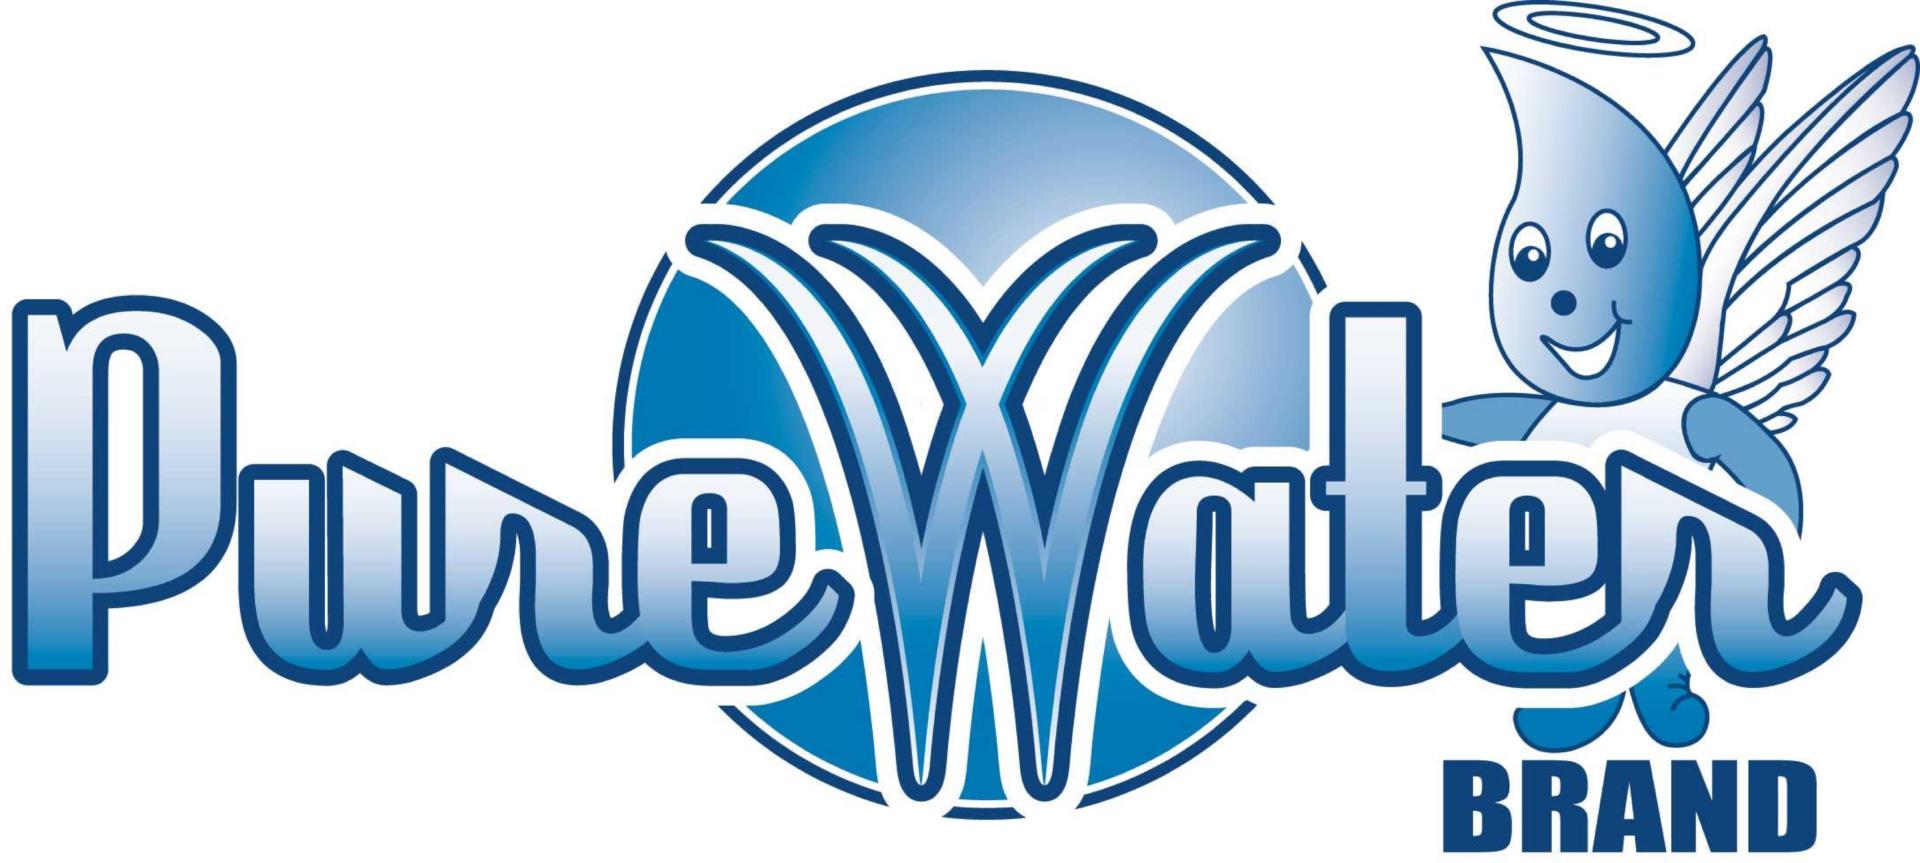 PWB Logo (c662b6f7-f971-41e2-9e5e-6c8f00124c4c)